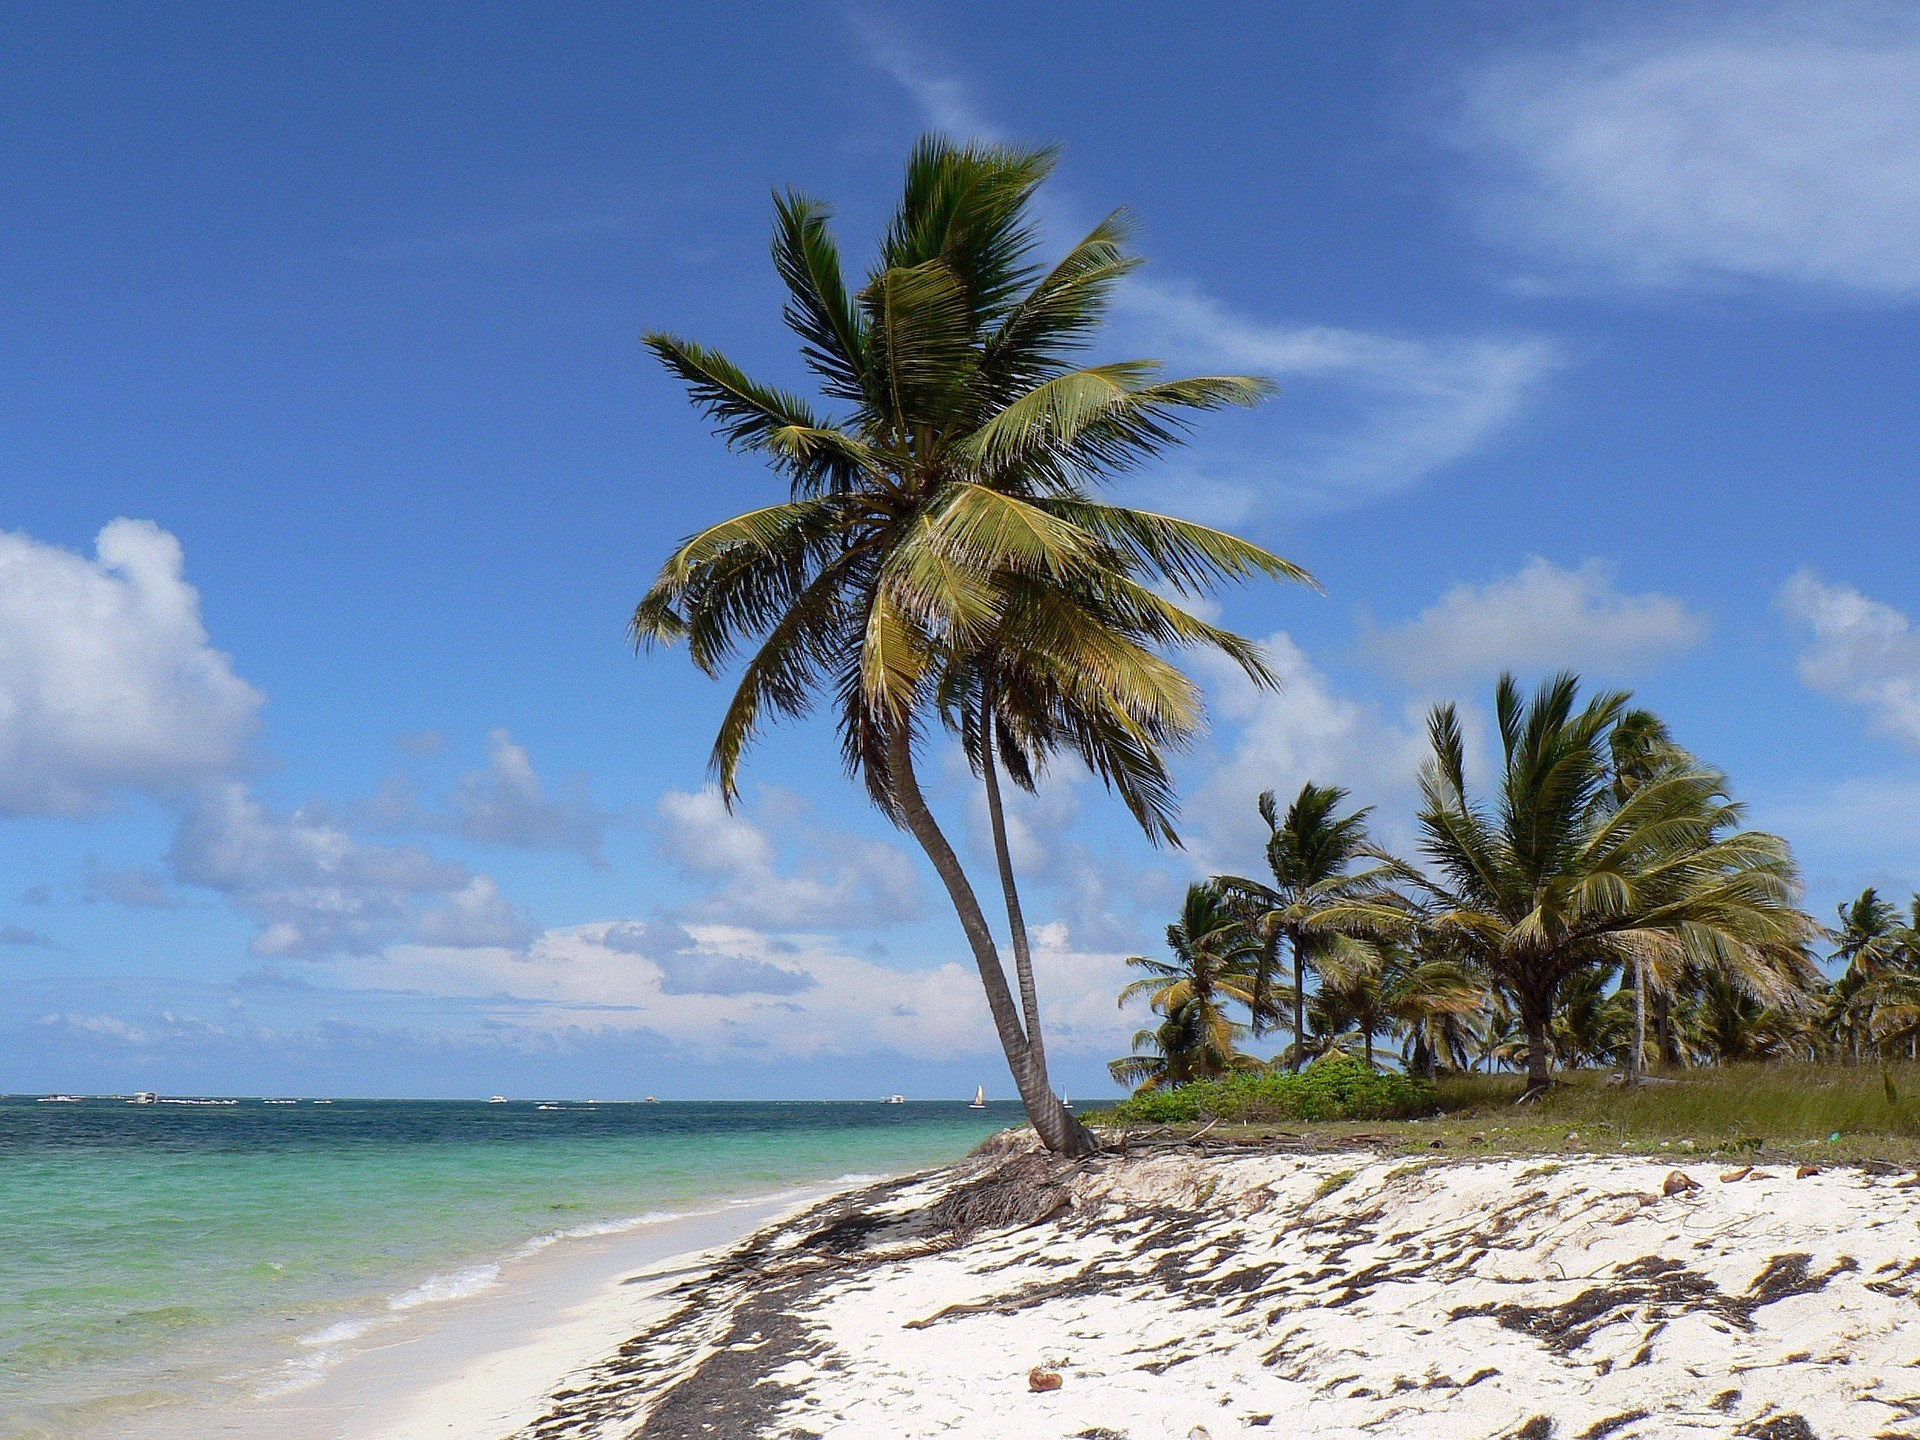 Repubblica Dominicana - Foto di Albert Dezetter da Pixabay